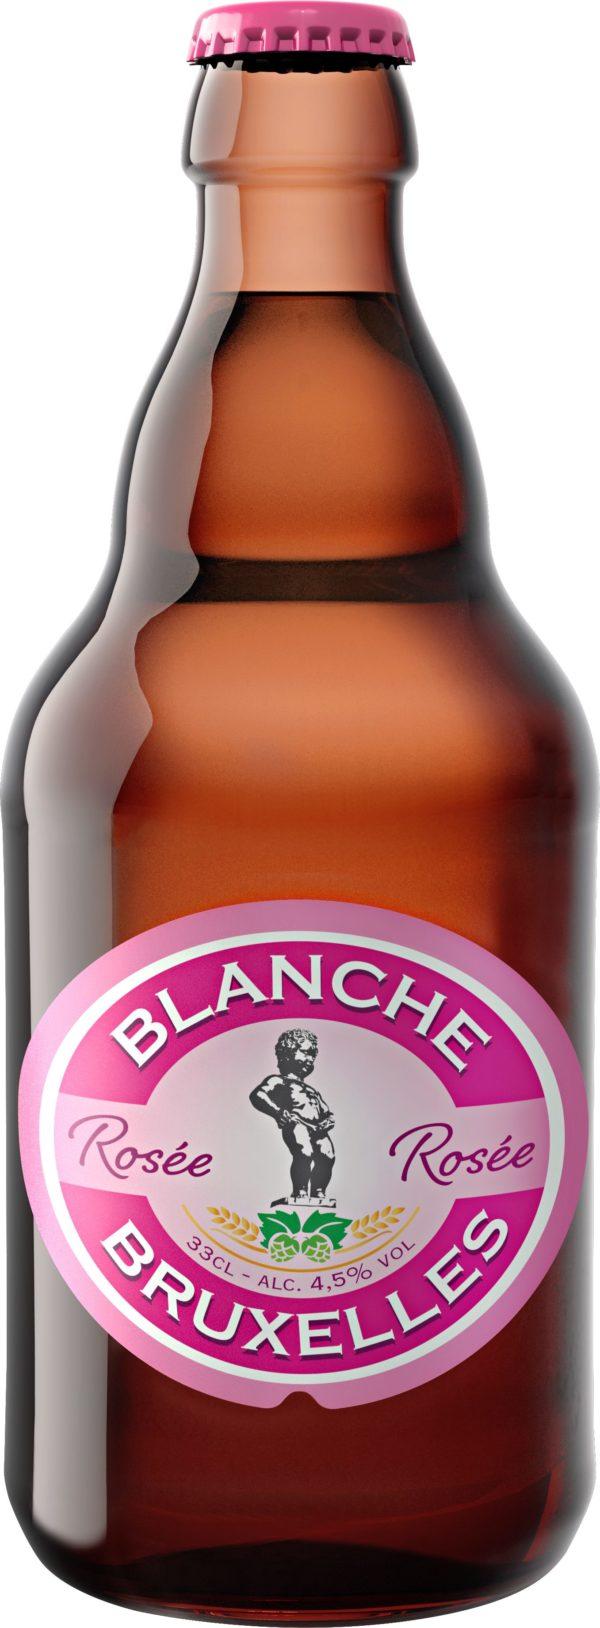 BEER-BLANCHE_ROSEE_GODO